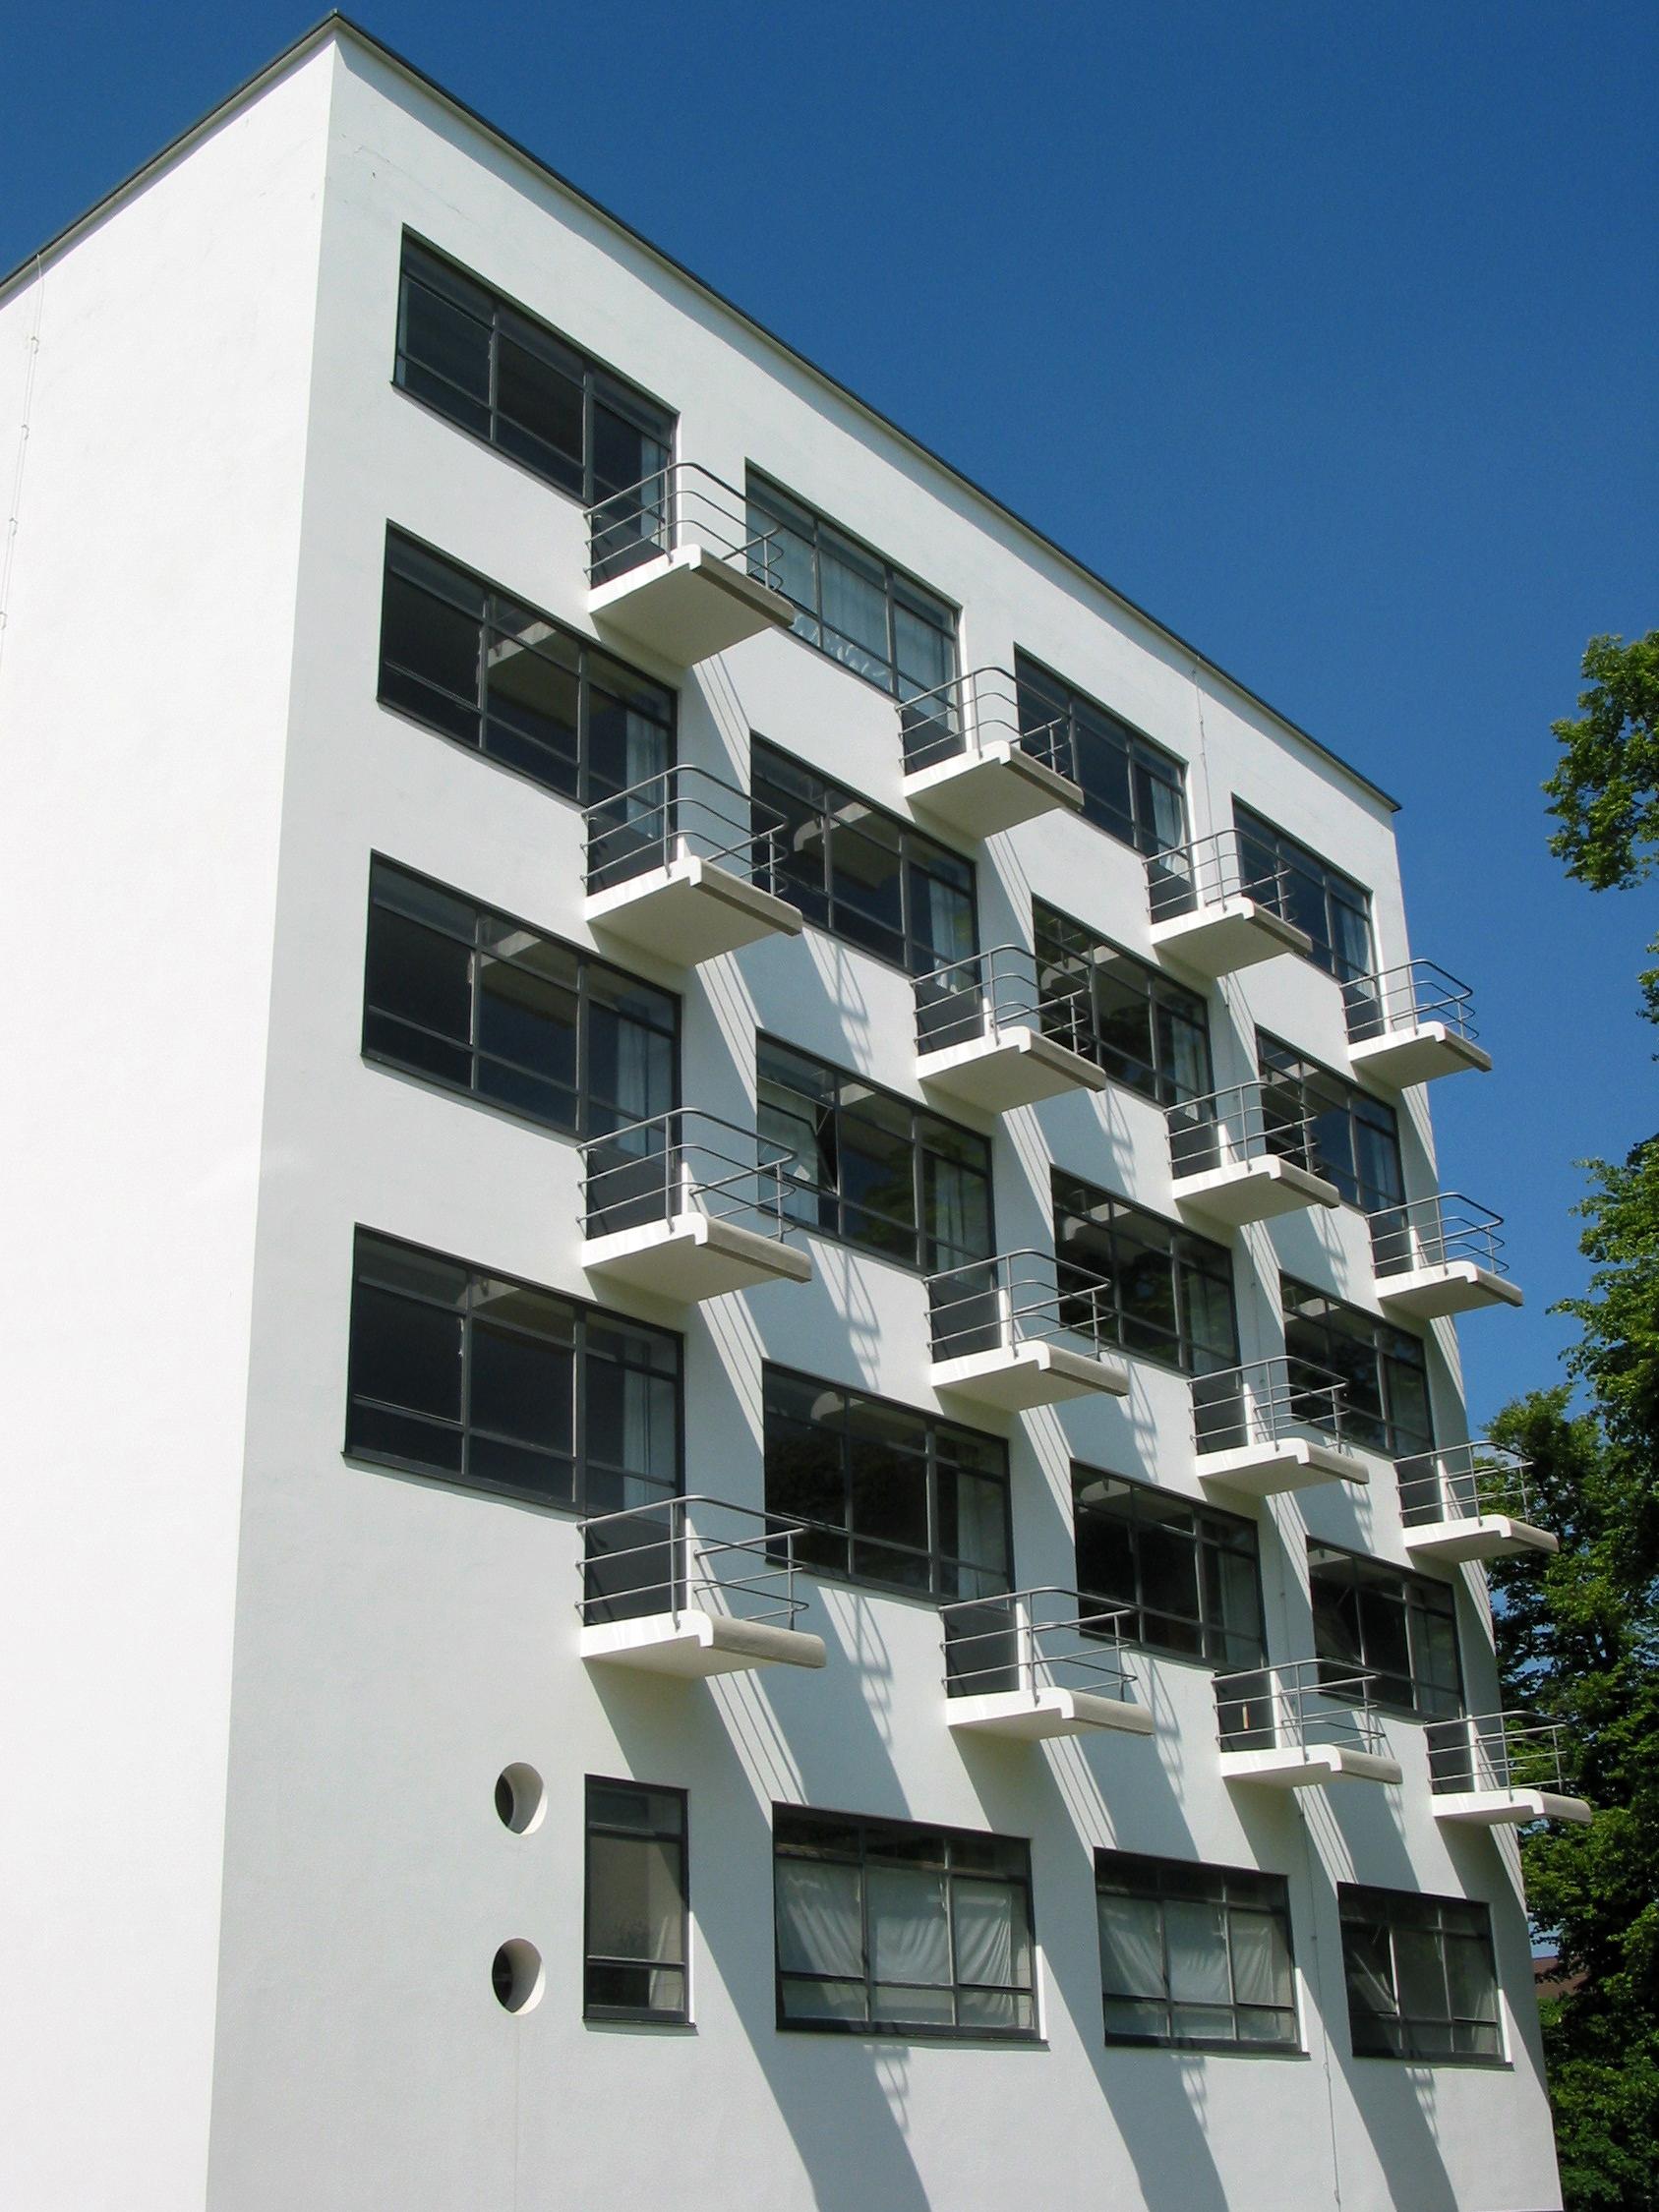 file bauhaus dessau atelierhaus wohnheim wikimedia commons. Black Bedroom Furniture Sets. Home Design Ideas